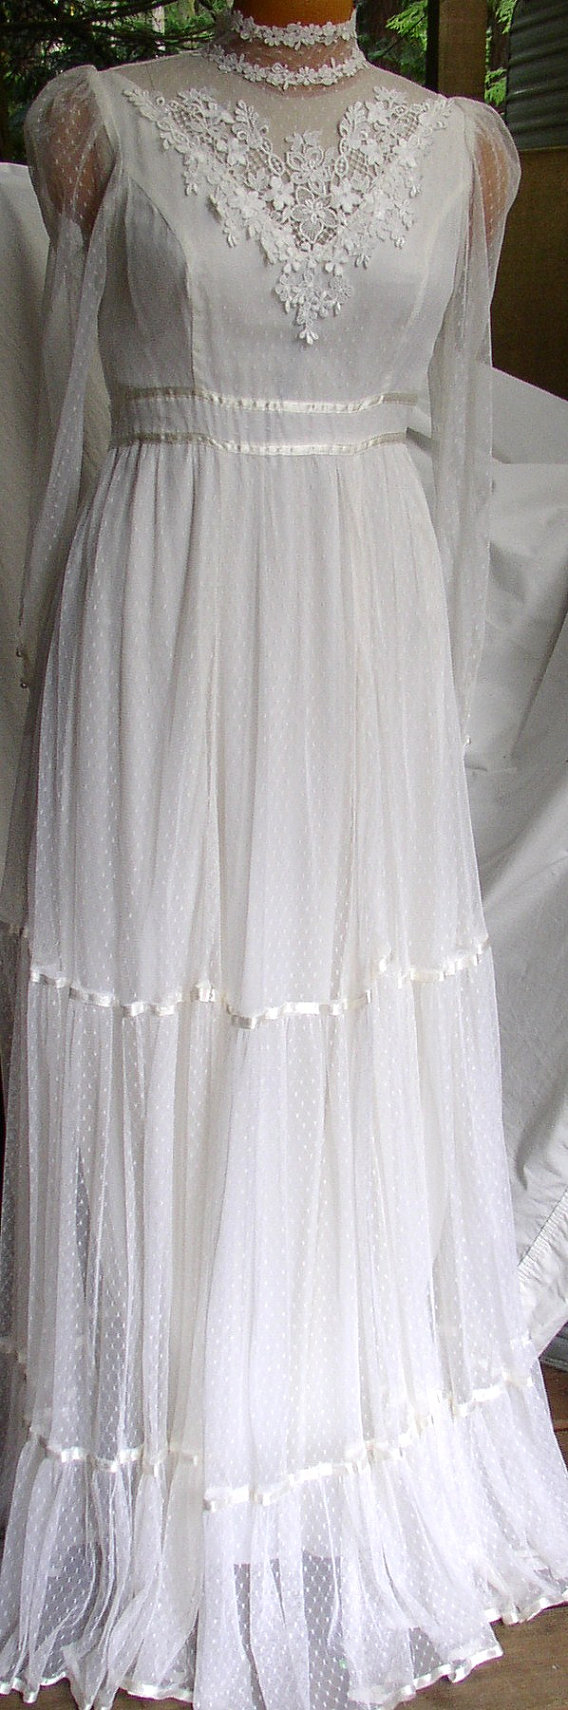 Gunne sax wedding dress  new pricewas GUNNESAX BRIDAL DRESS white gown  s